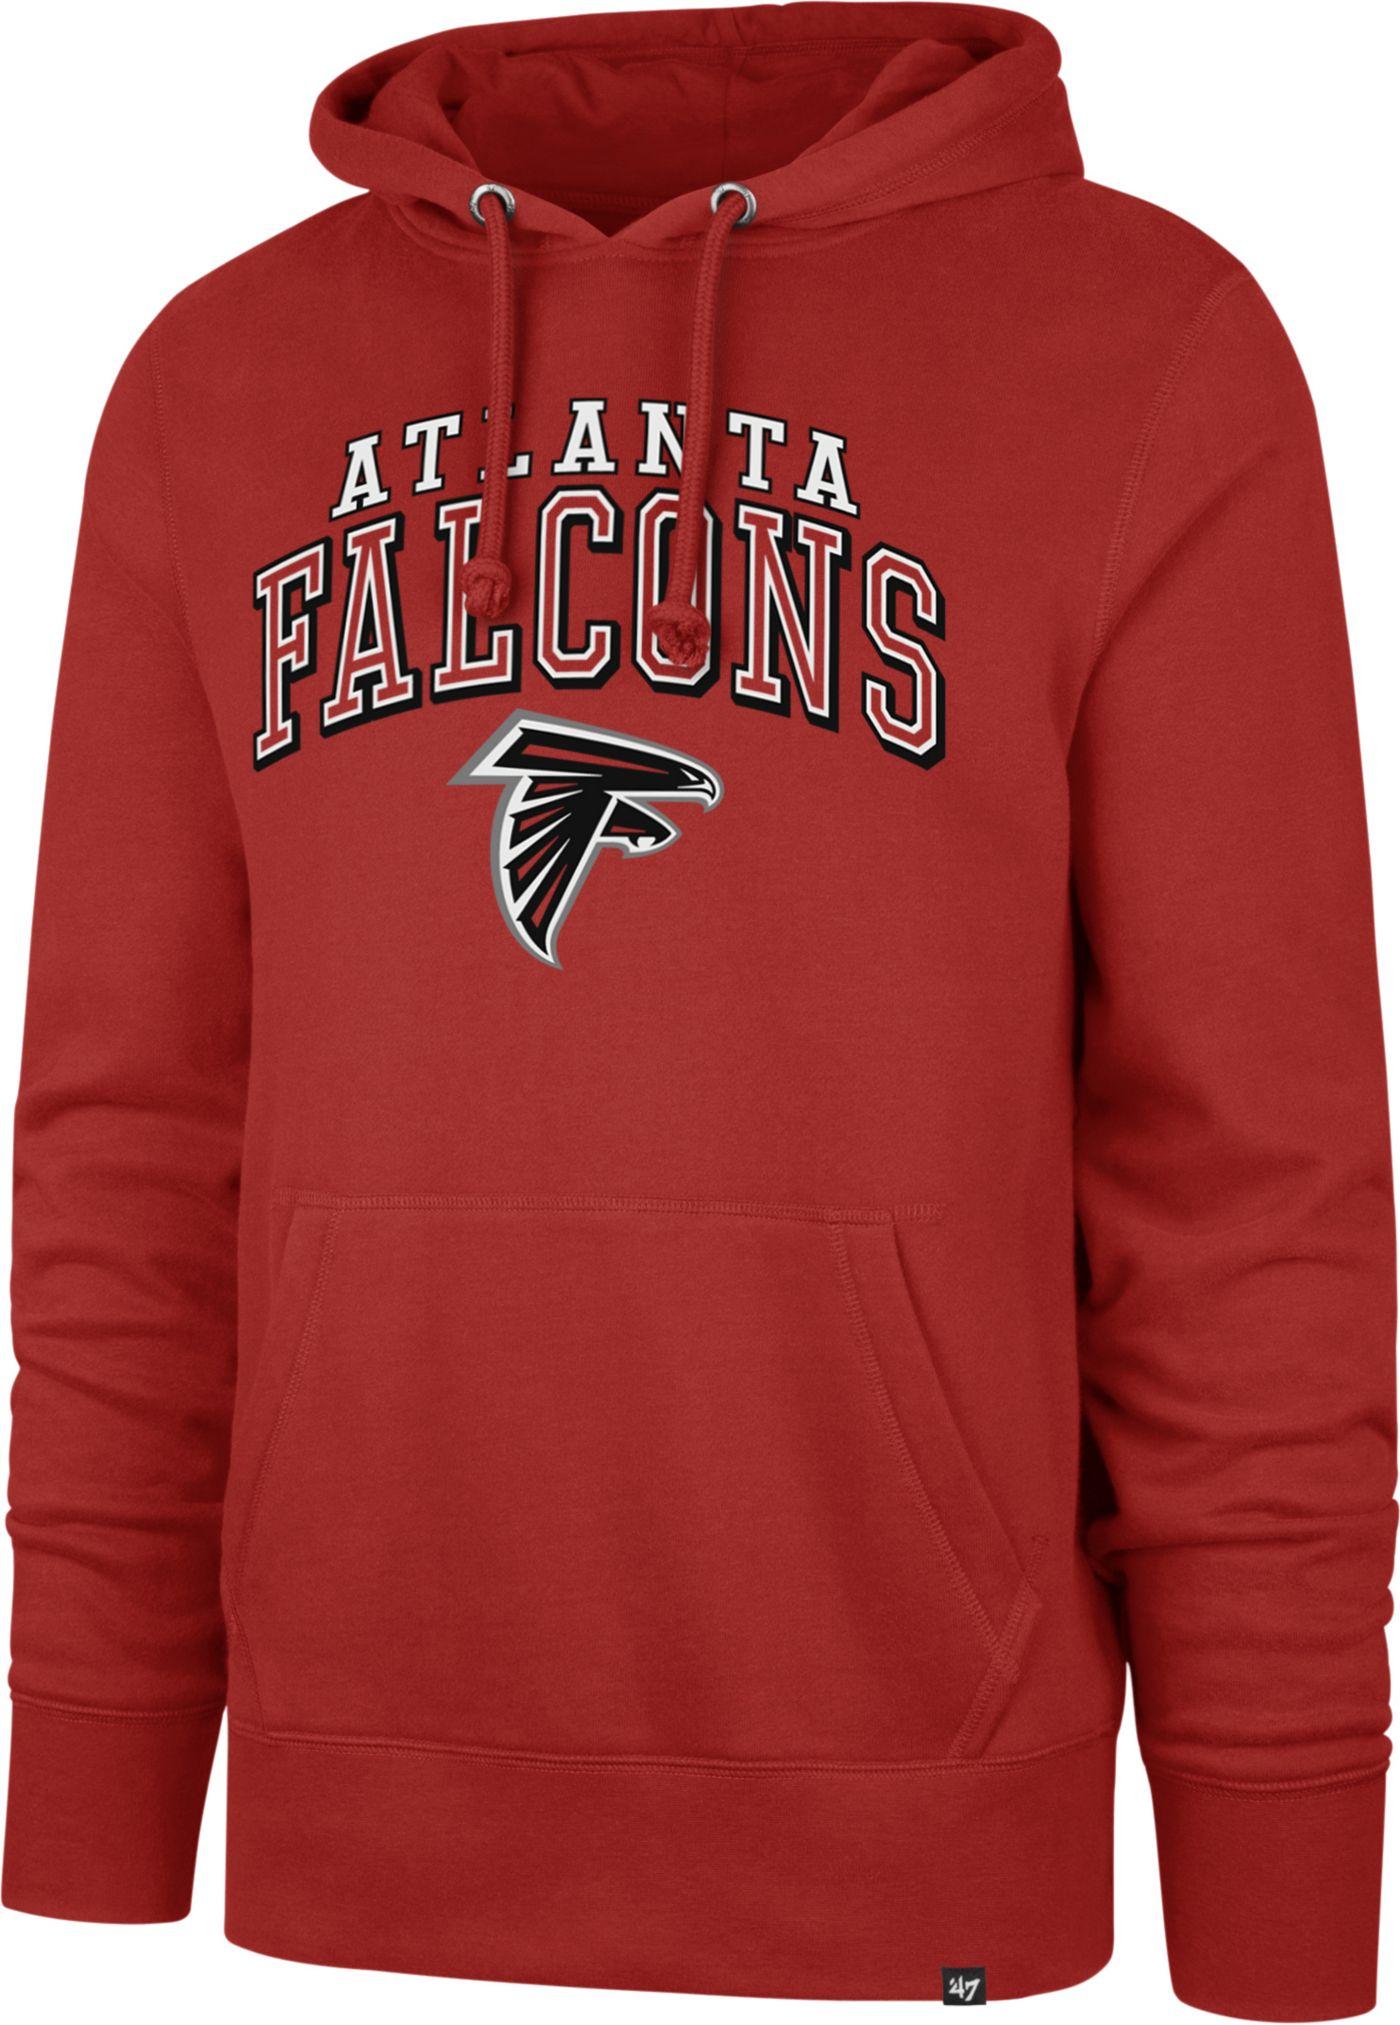 '47 Men's Atlanta Falcons Headline Red Hoodie